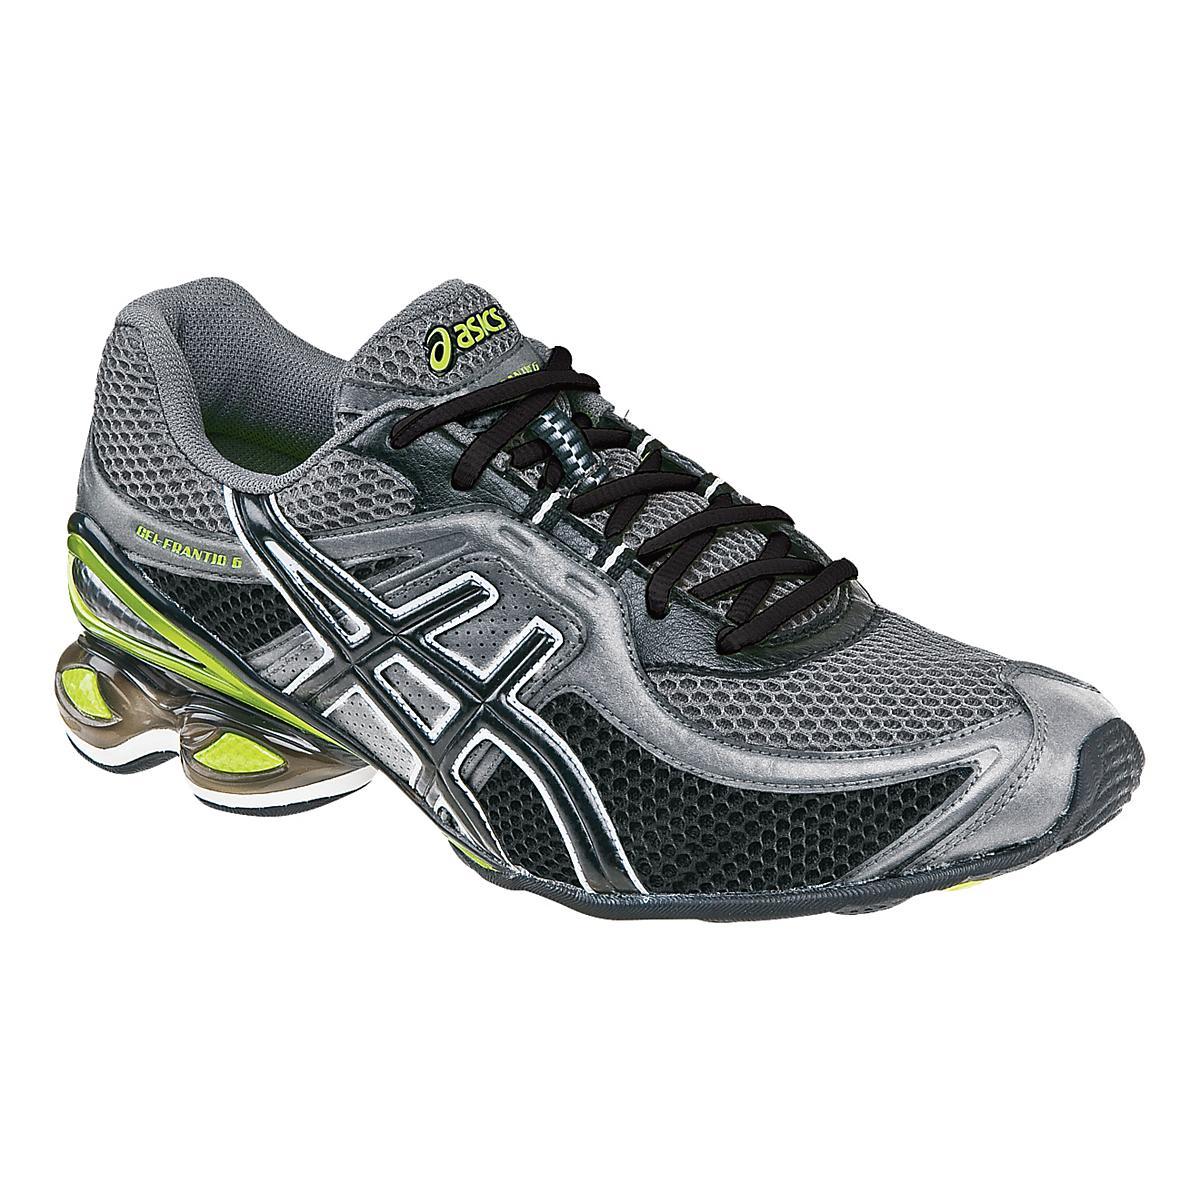 b6bb33fbc33f Mens ASICS GEL-Frantic 6 Running Shoe at Road Runner Sports